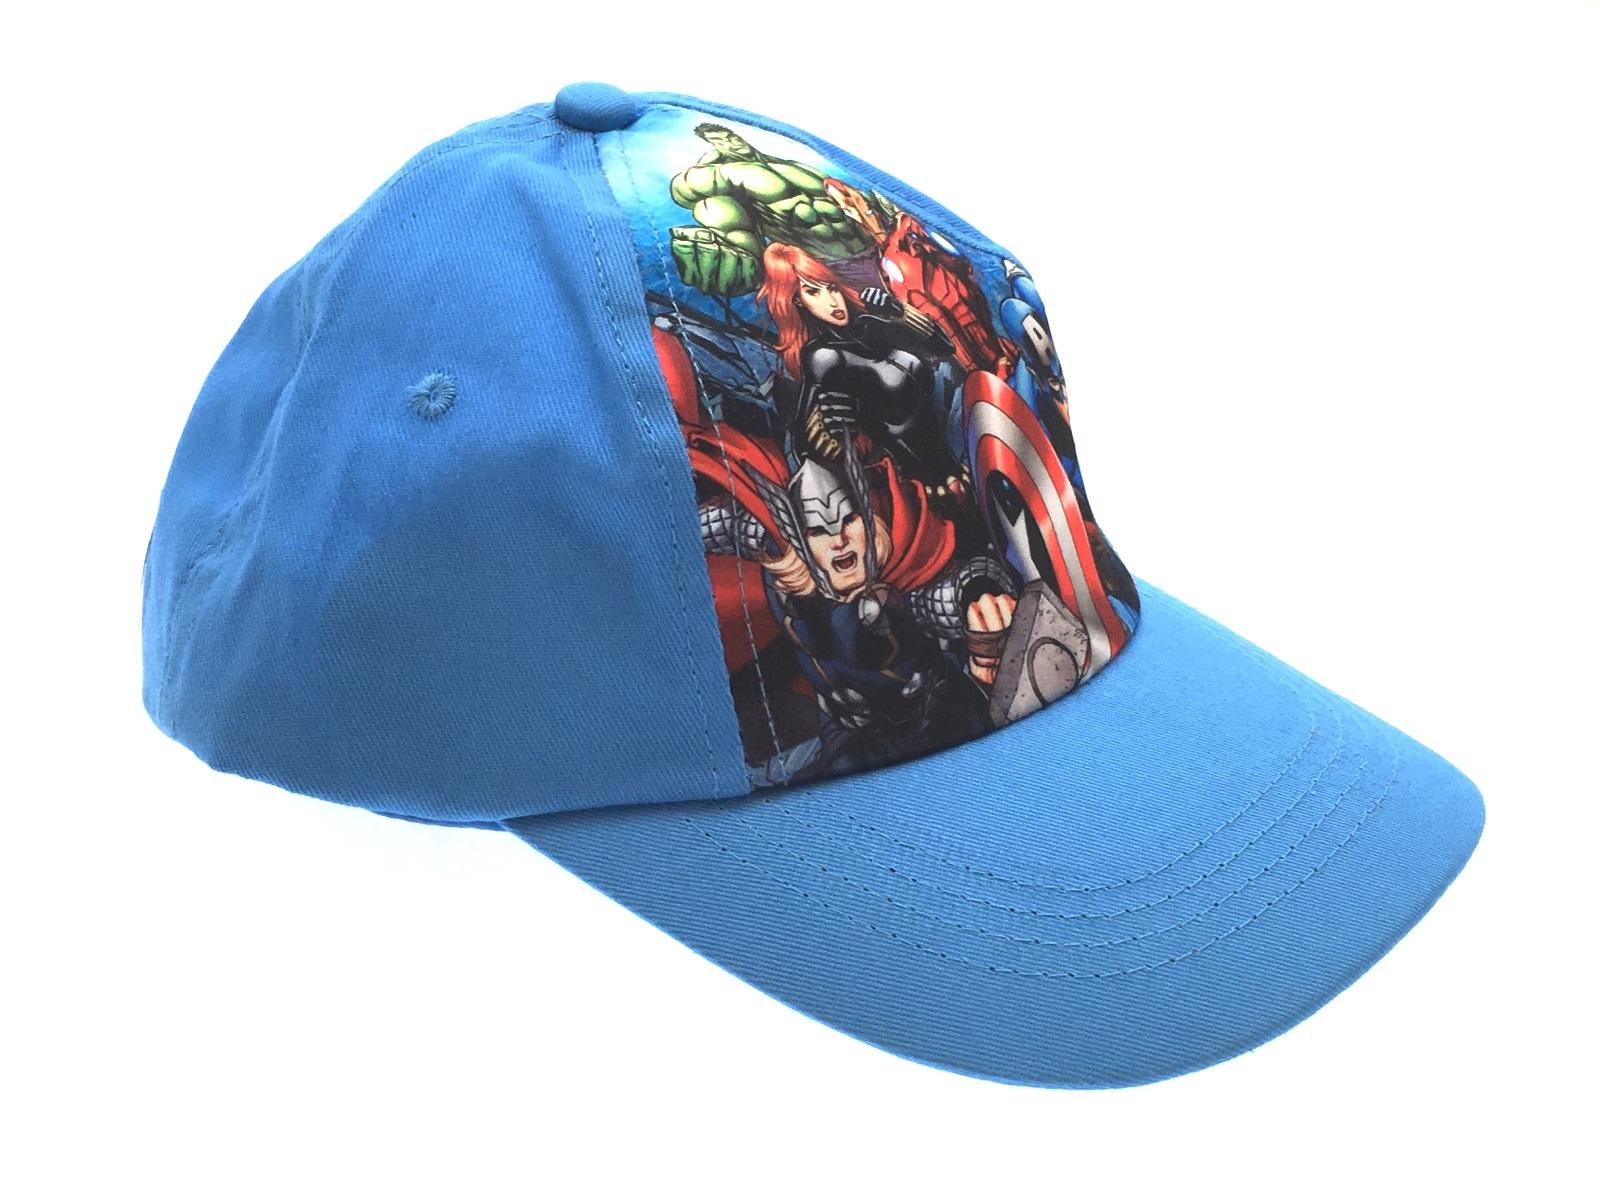 character baseball cap adjustable peaked summer hat